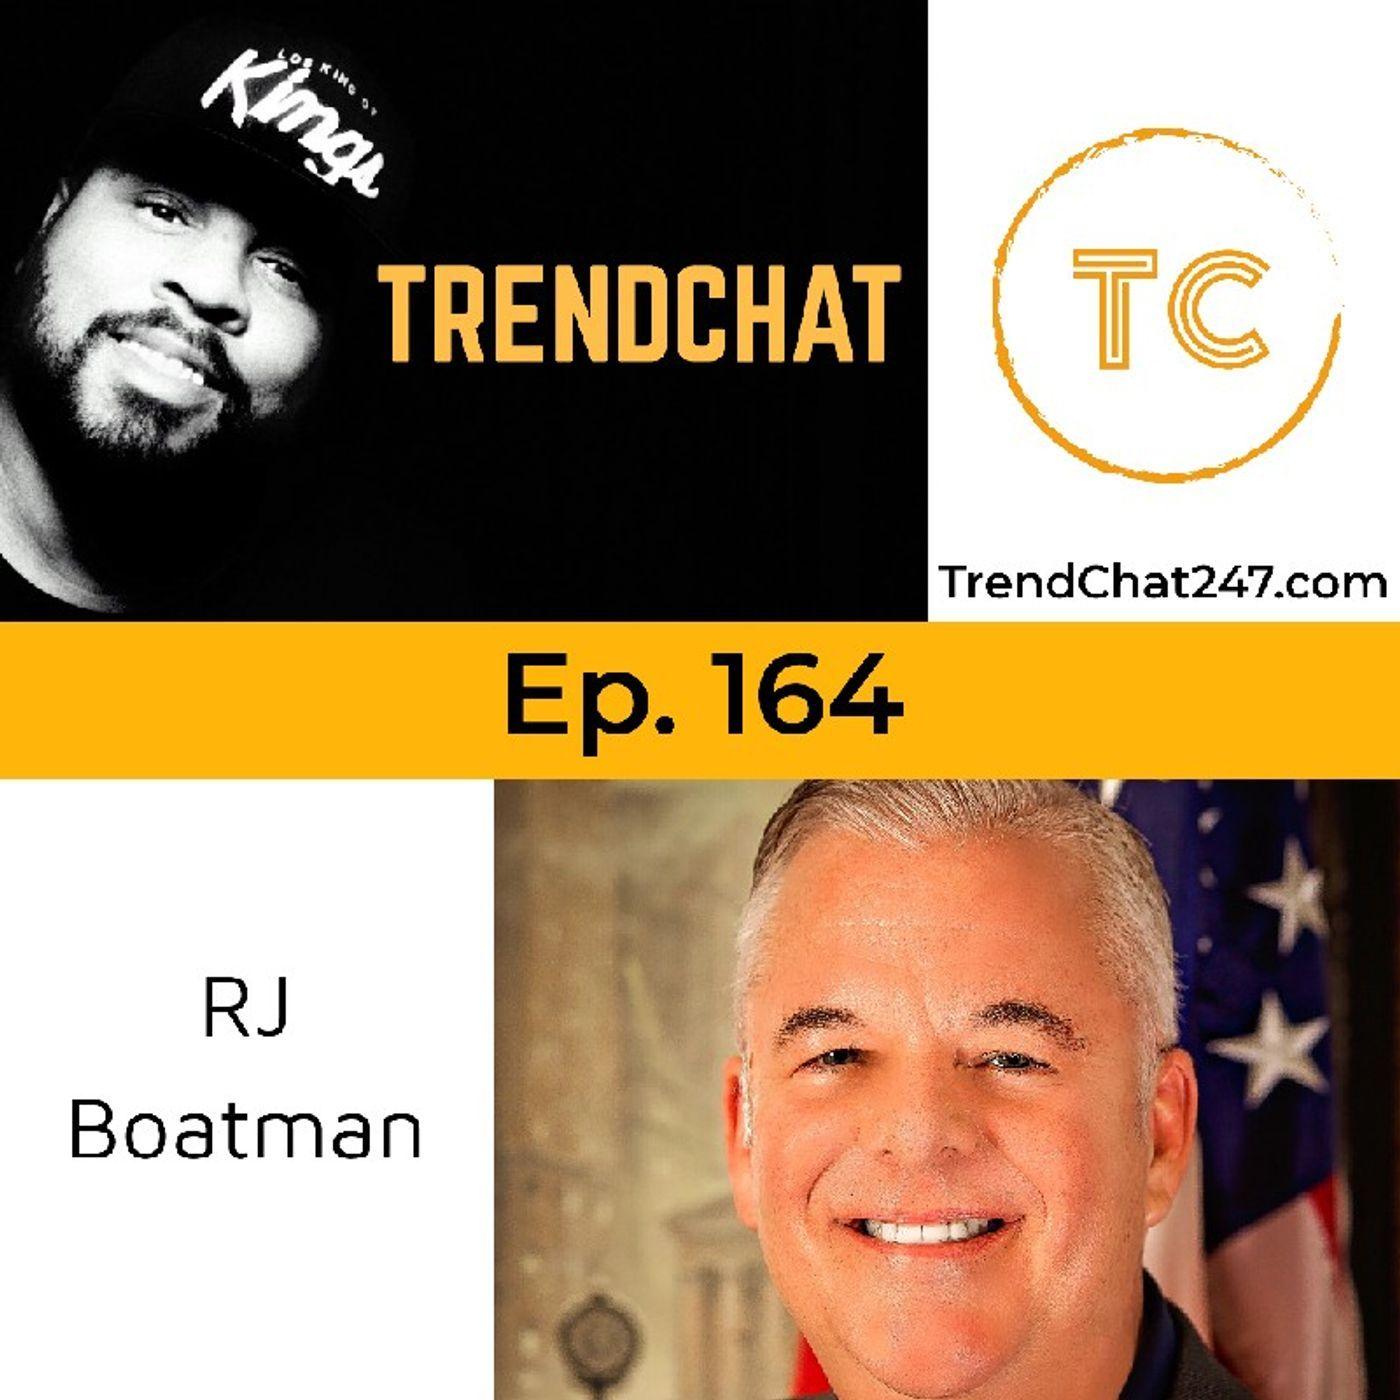 Ep. 164 - Candidate Series: RJ Boatman For U.S. Congress (TX-36)